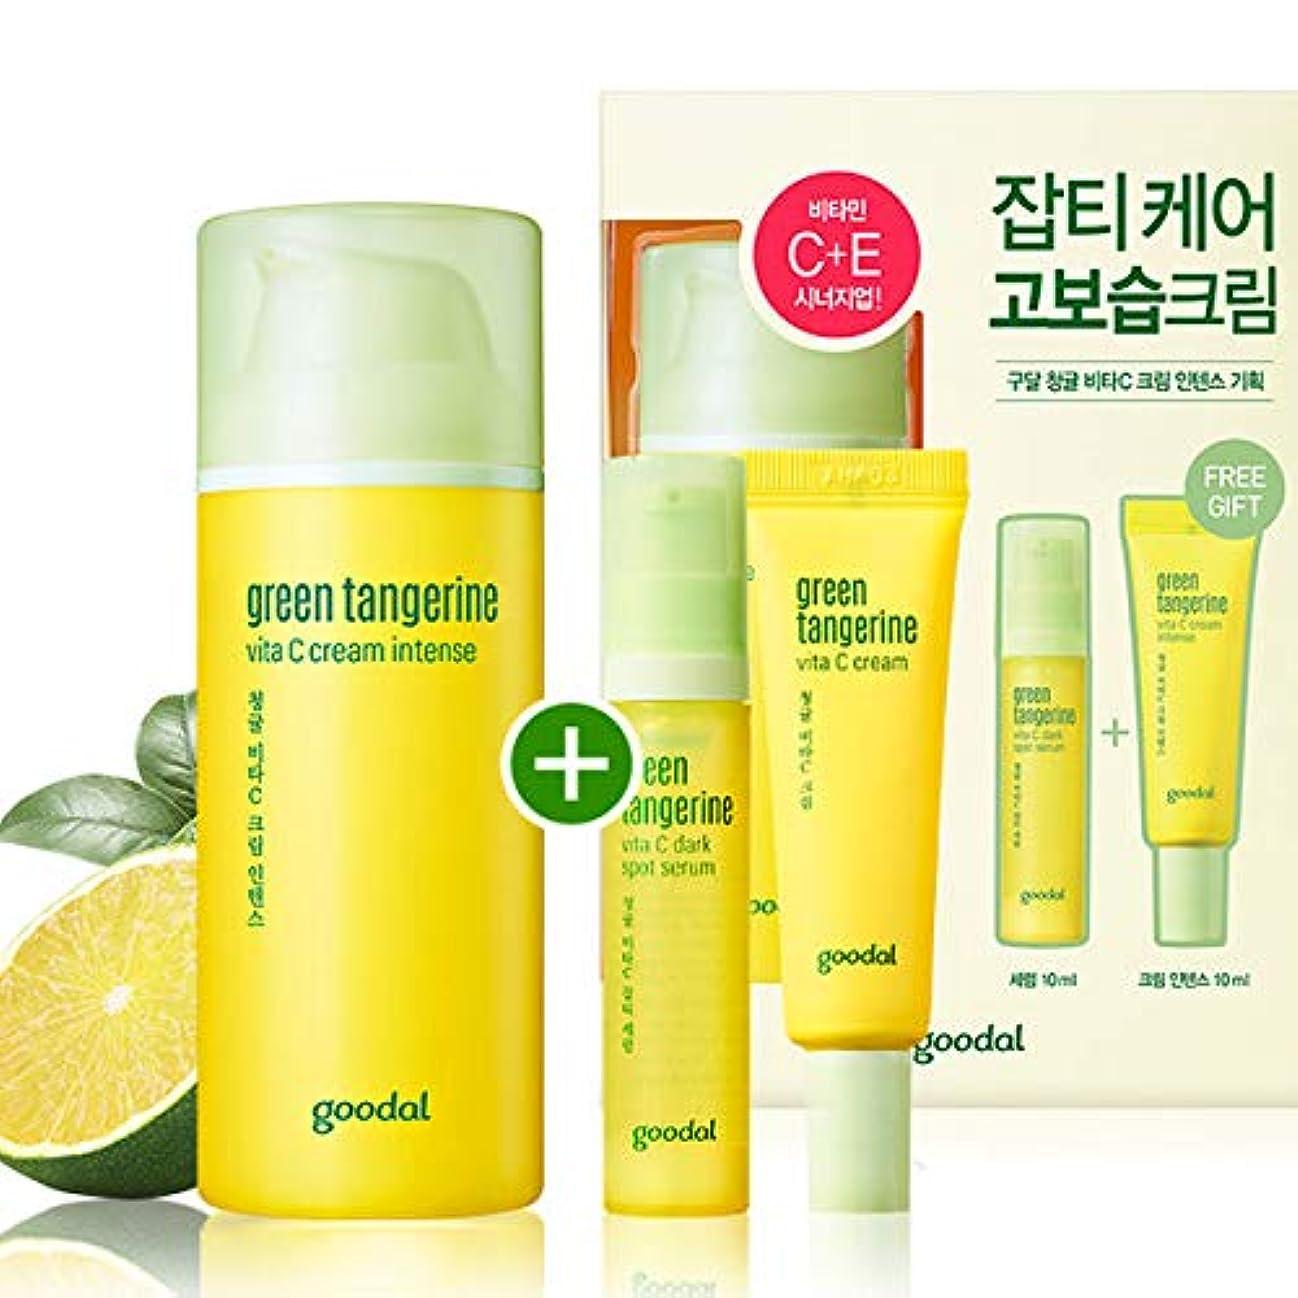 [Goodal] Green Tangerine Vita C cream Intense 50ml /グリーンタンジェリンビタCクリームインテンス50ml [並行輸入品]